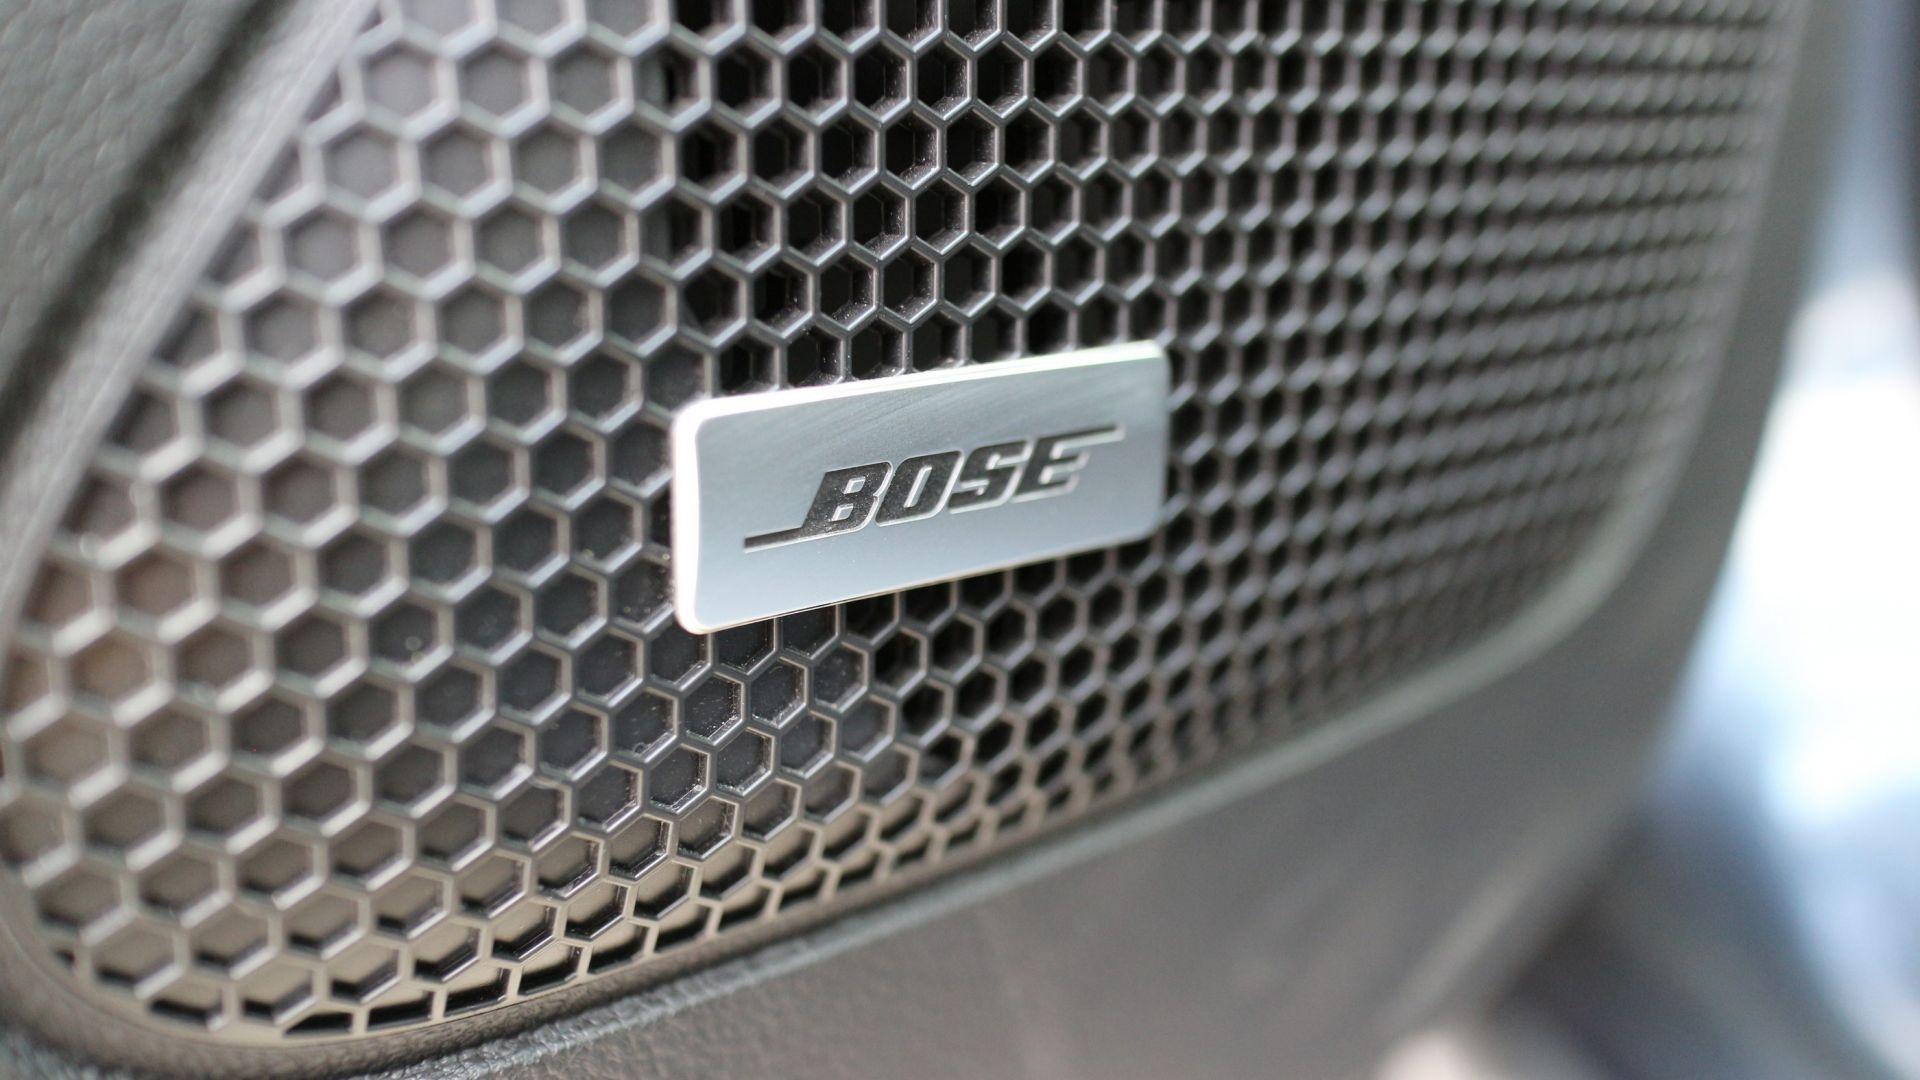 Test drive renault kadjar dci 110 cv energy bose la - Impianto stereo casa bose ...